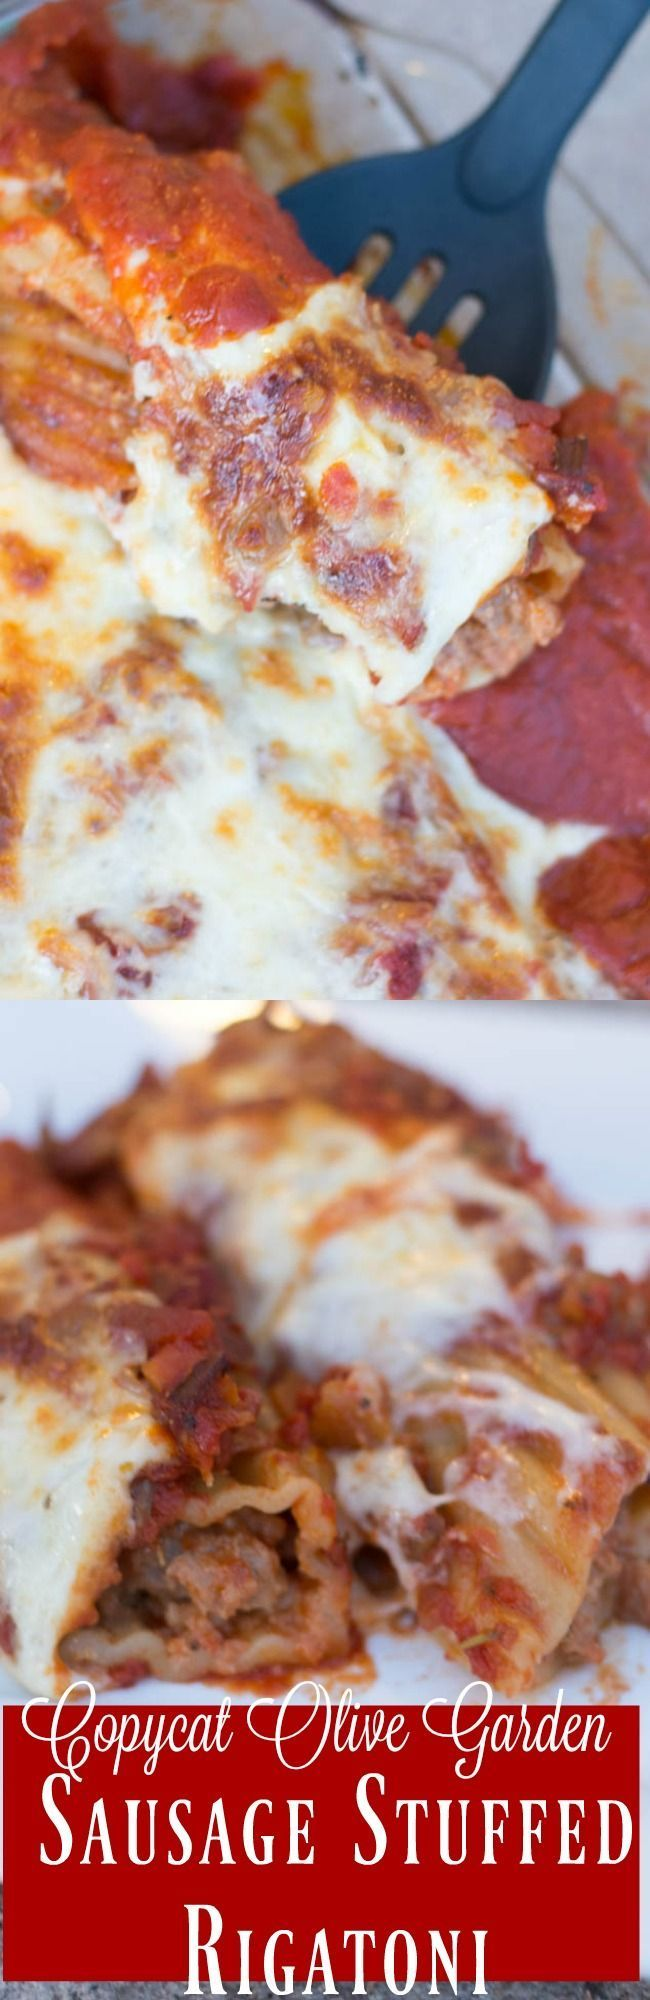 Copycat Olive Garden Recipes / Copycat restaurant / Copycat Olive Garden Sausage stuffed Rigatoni / Pasta Recipes with Sauce